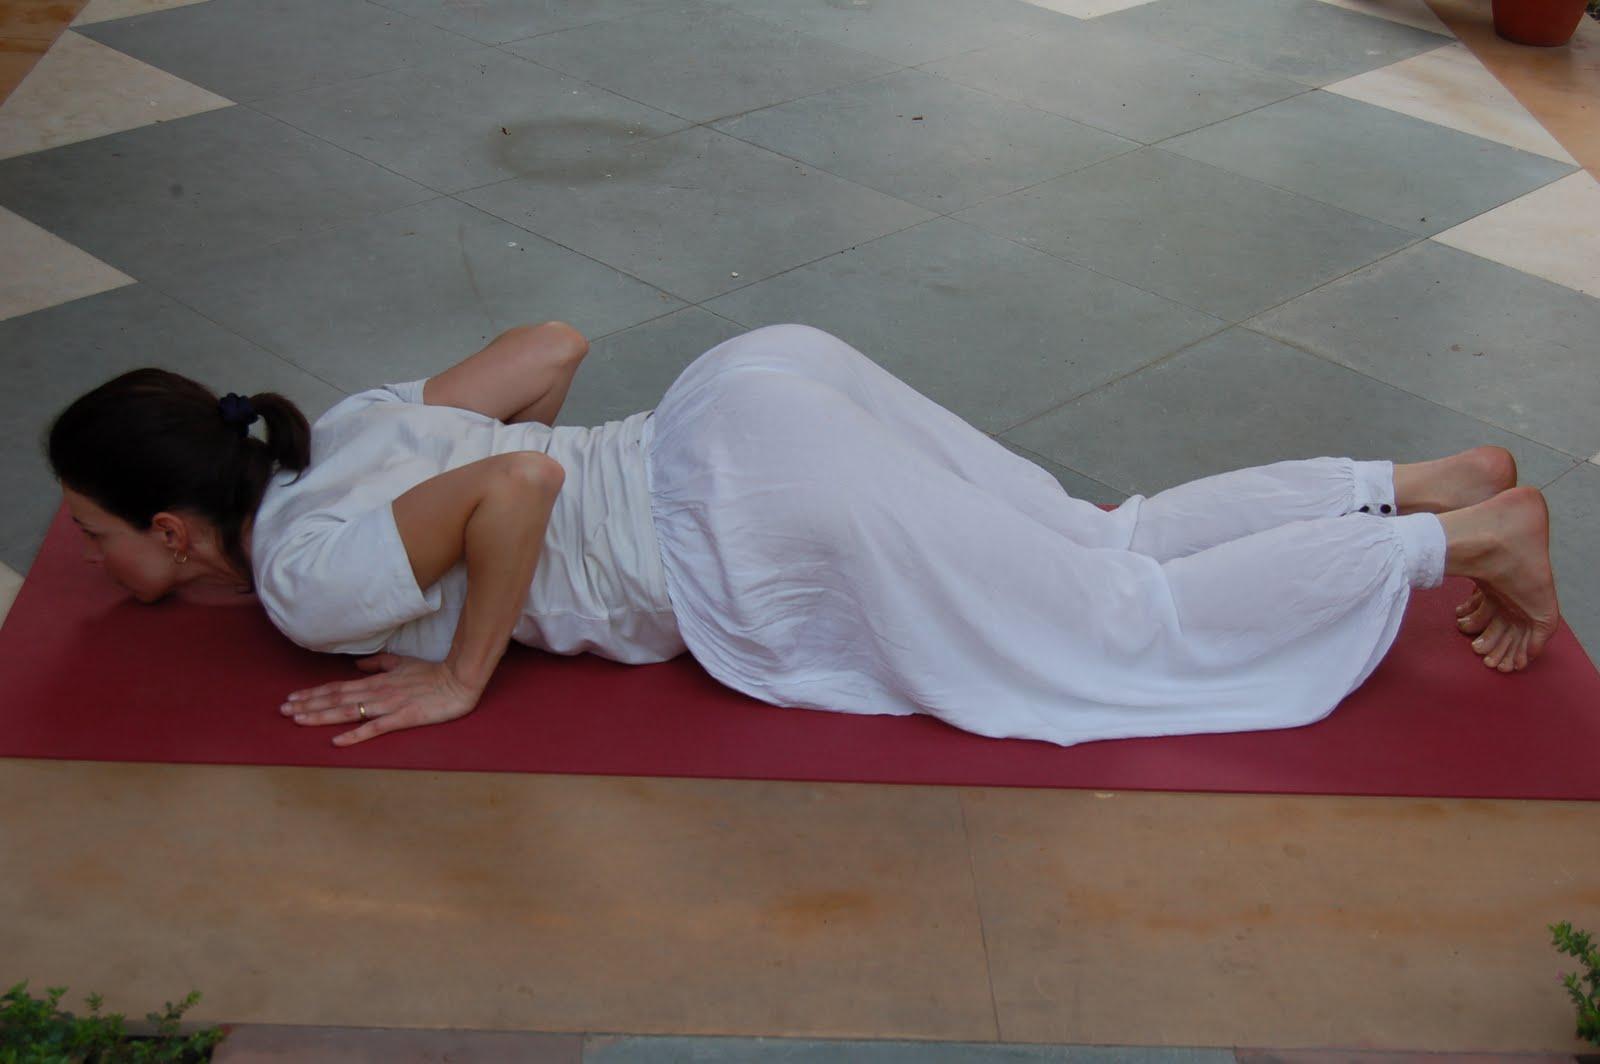 Yoga Lifestyle: Sun Salutation - 'Surya Namaskara'